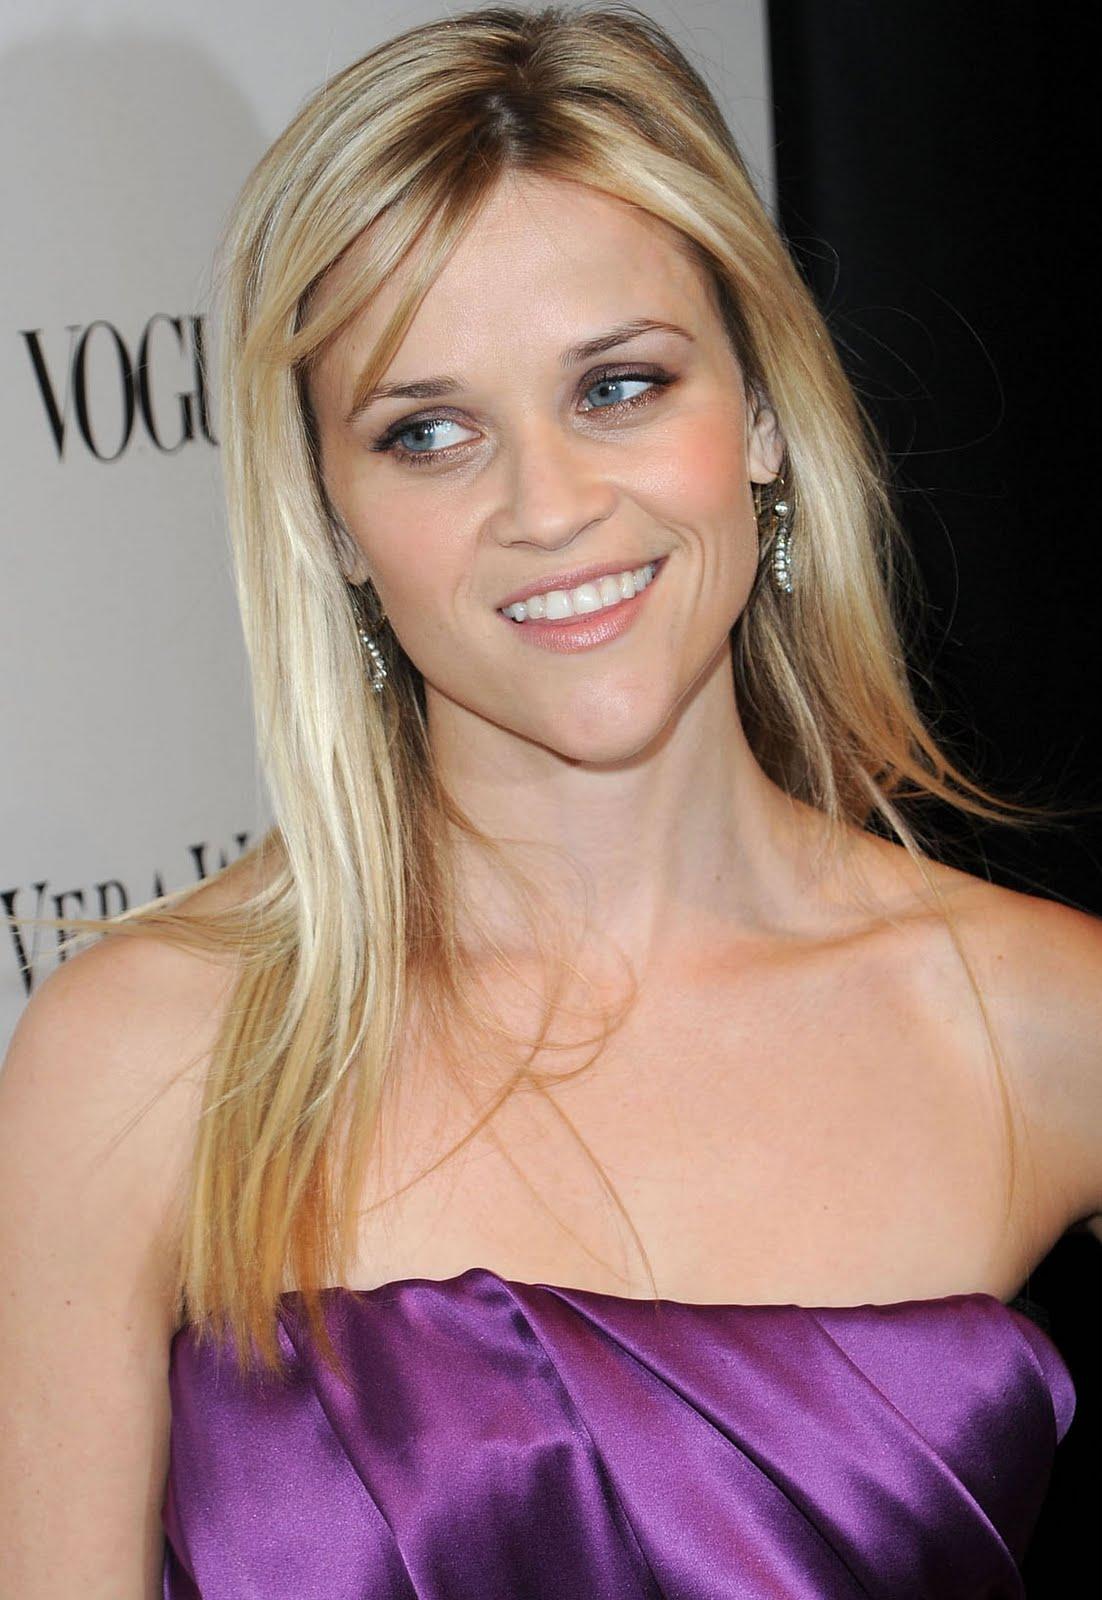 http://4.bp.blogspot.com/-fspx8urqPpo/TmX3ELqAzpI/AAAAAAAAFrY/r2XOKNt2OOY/s1600/Reese-Witherspoon5.jpg